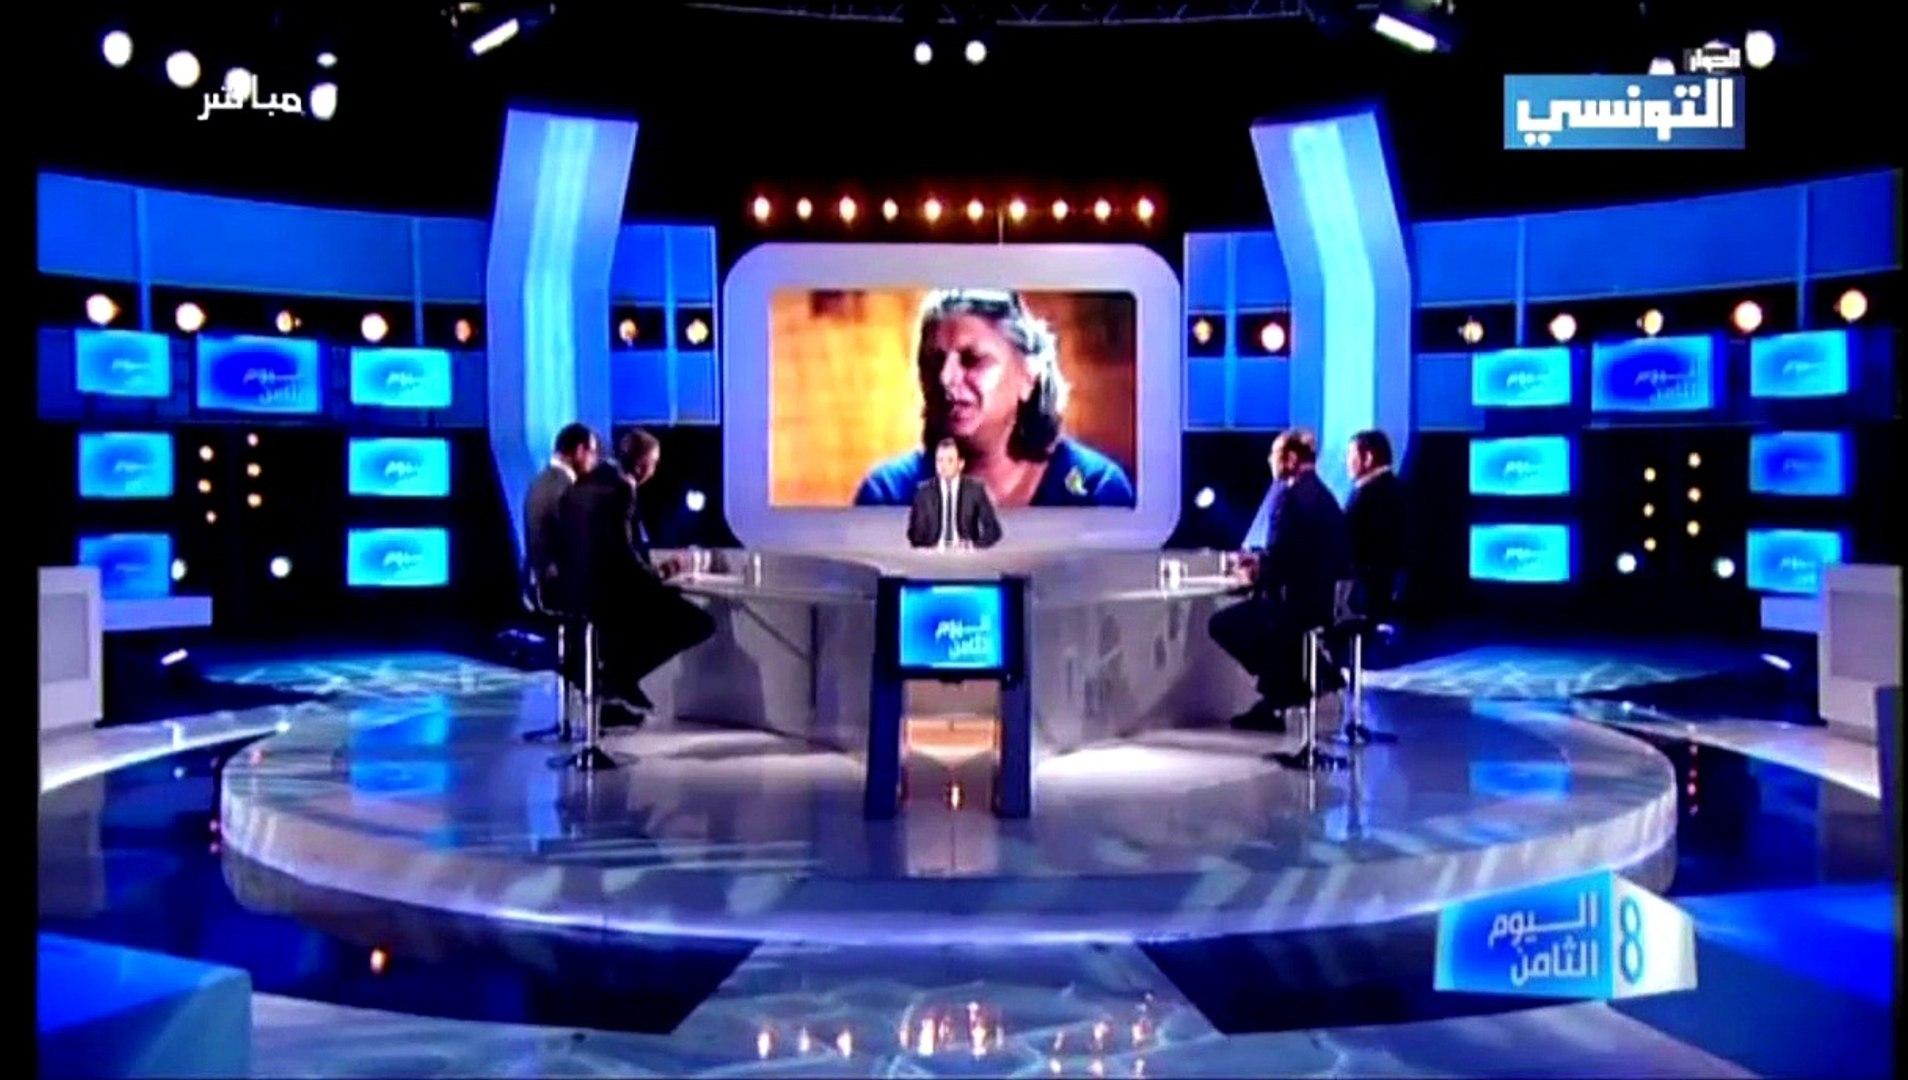 J8 : Reportage Aljazeera Belaid - 31/10 - part 1 - اليوم الثامن